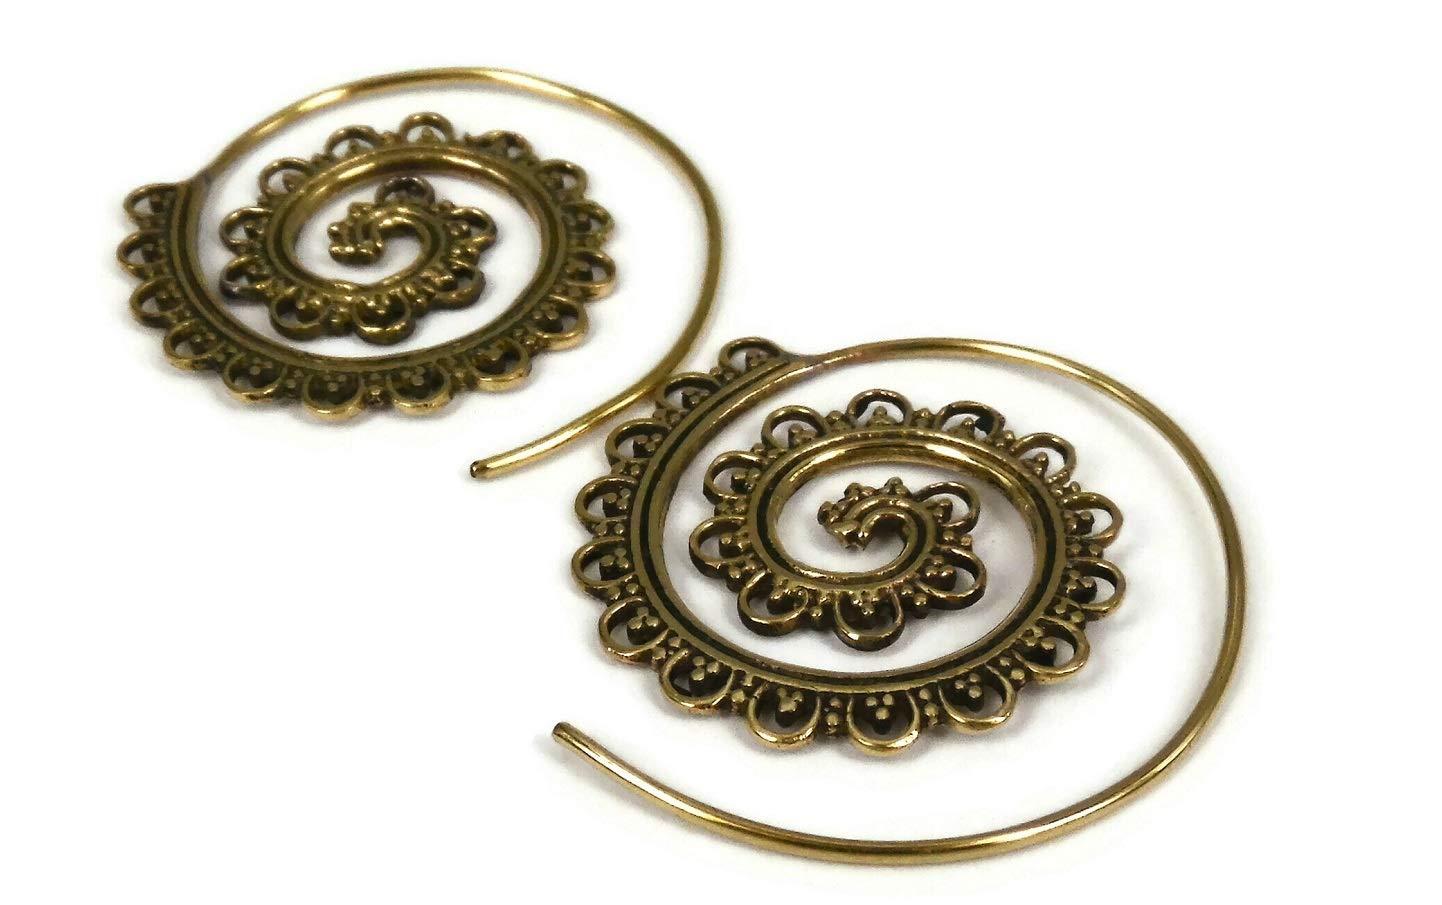 Large New Orleans Mall Bohemian Vintage Hoop Popular popular Earrings Bra Tribal Circles